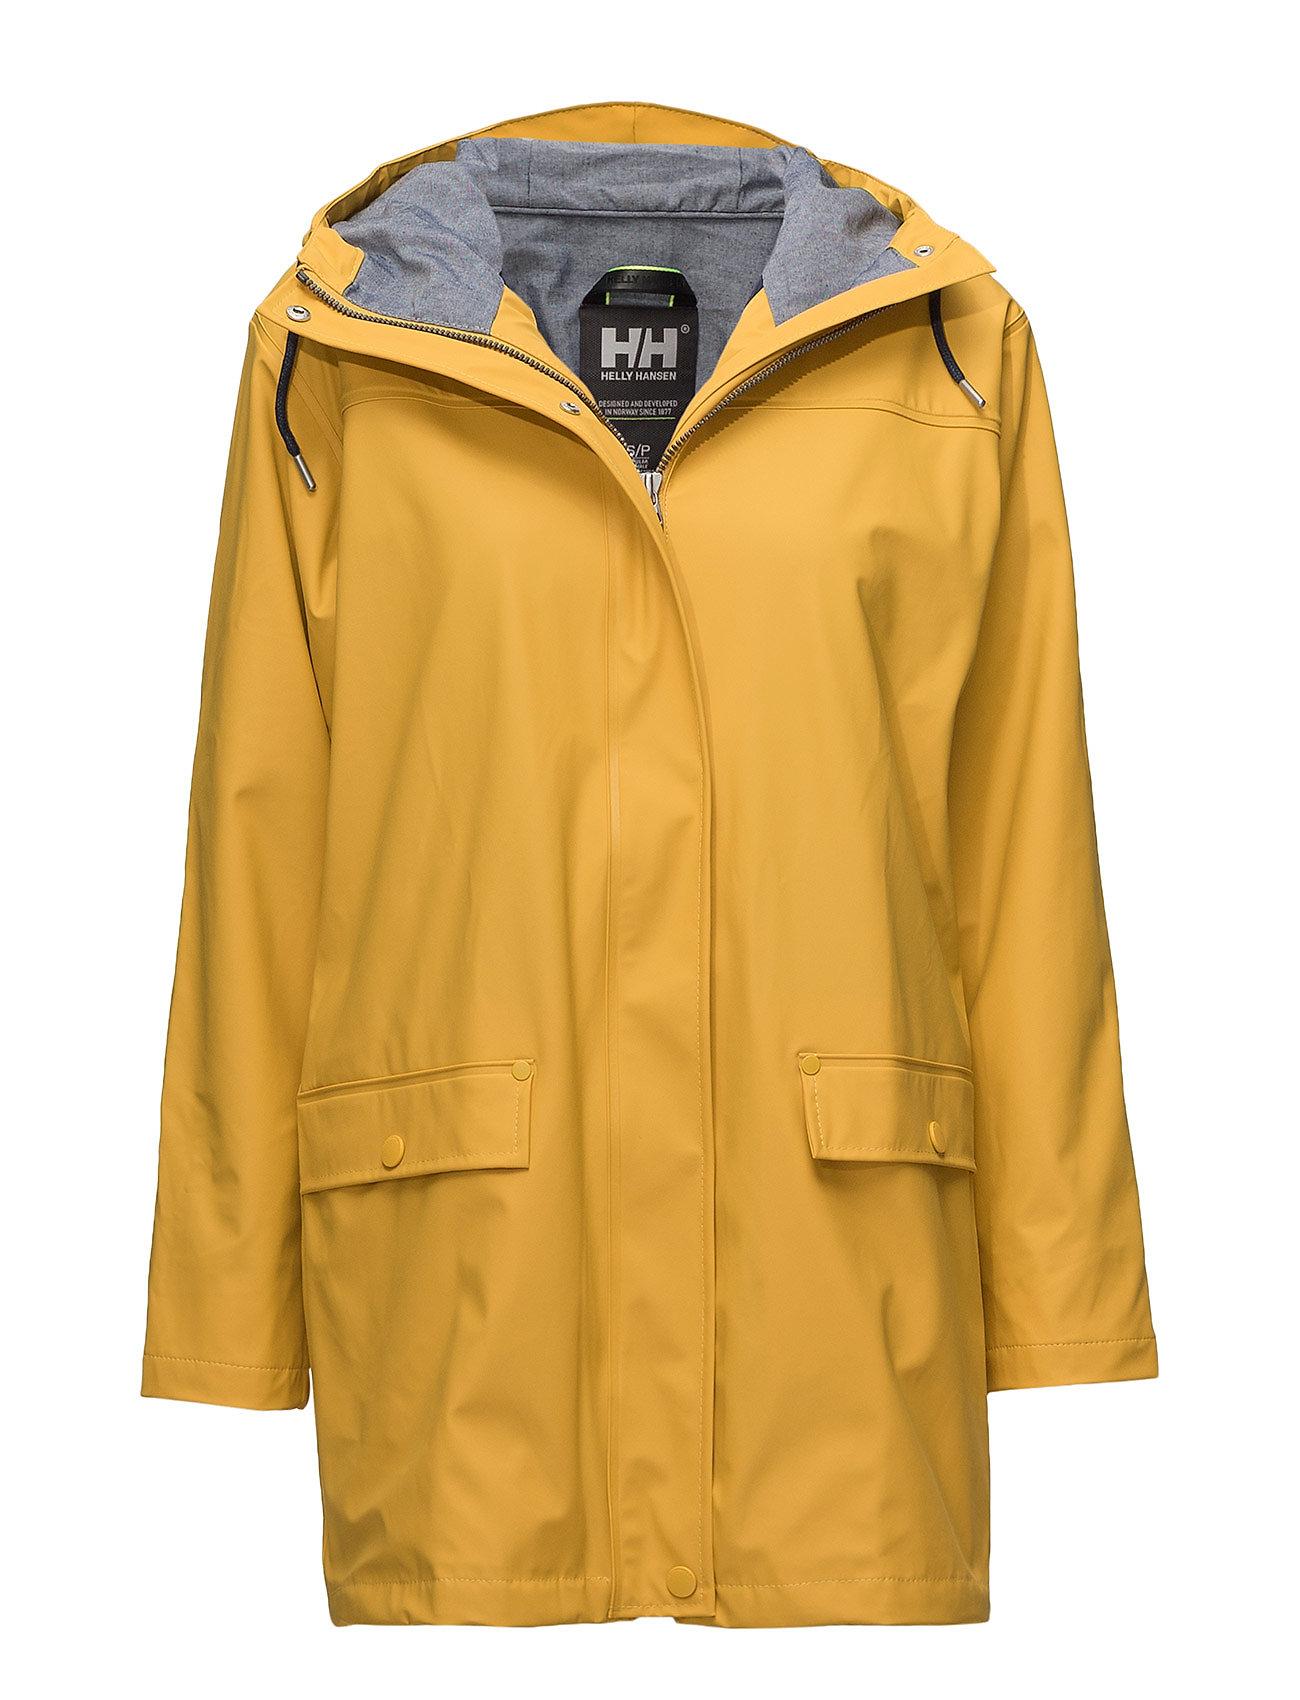 HELLY HANSEN W Dunloe Jacket Parka Jacke Mantel Gelb HELLY HANSEN